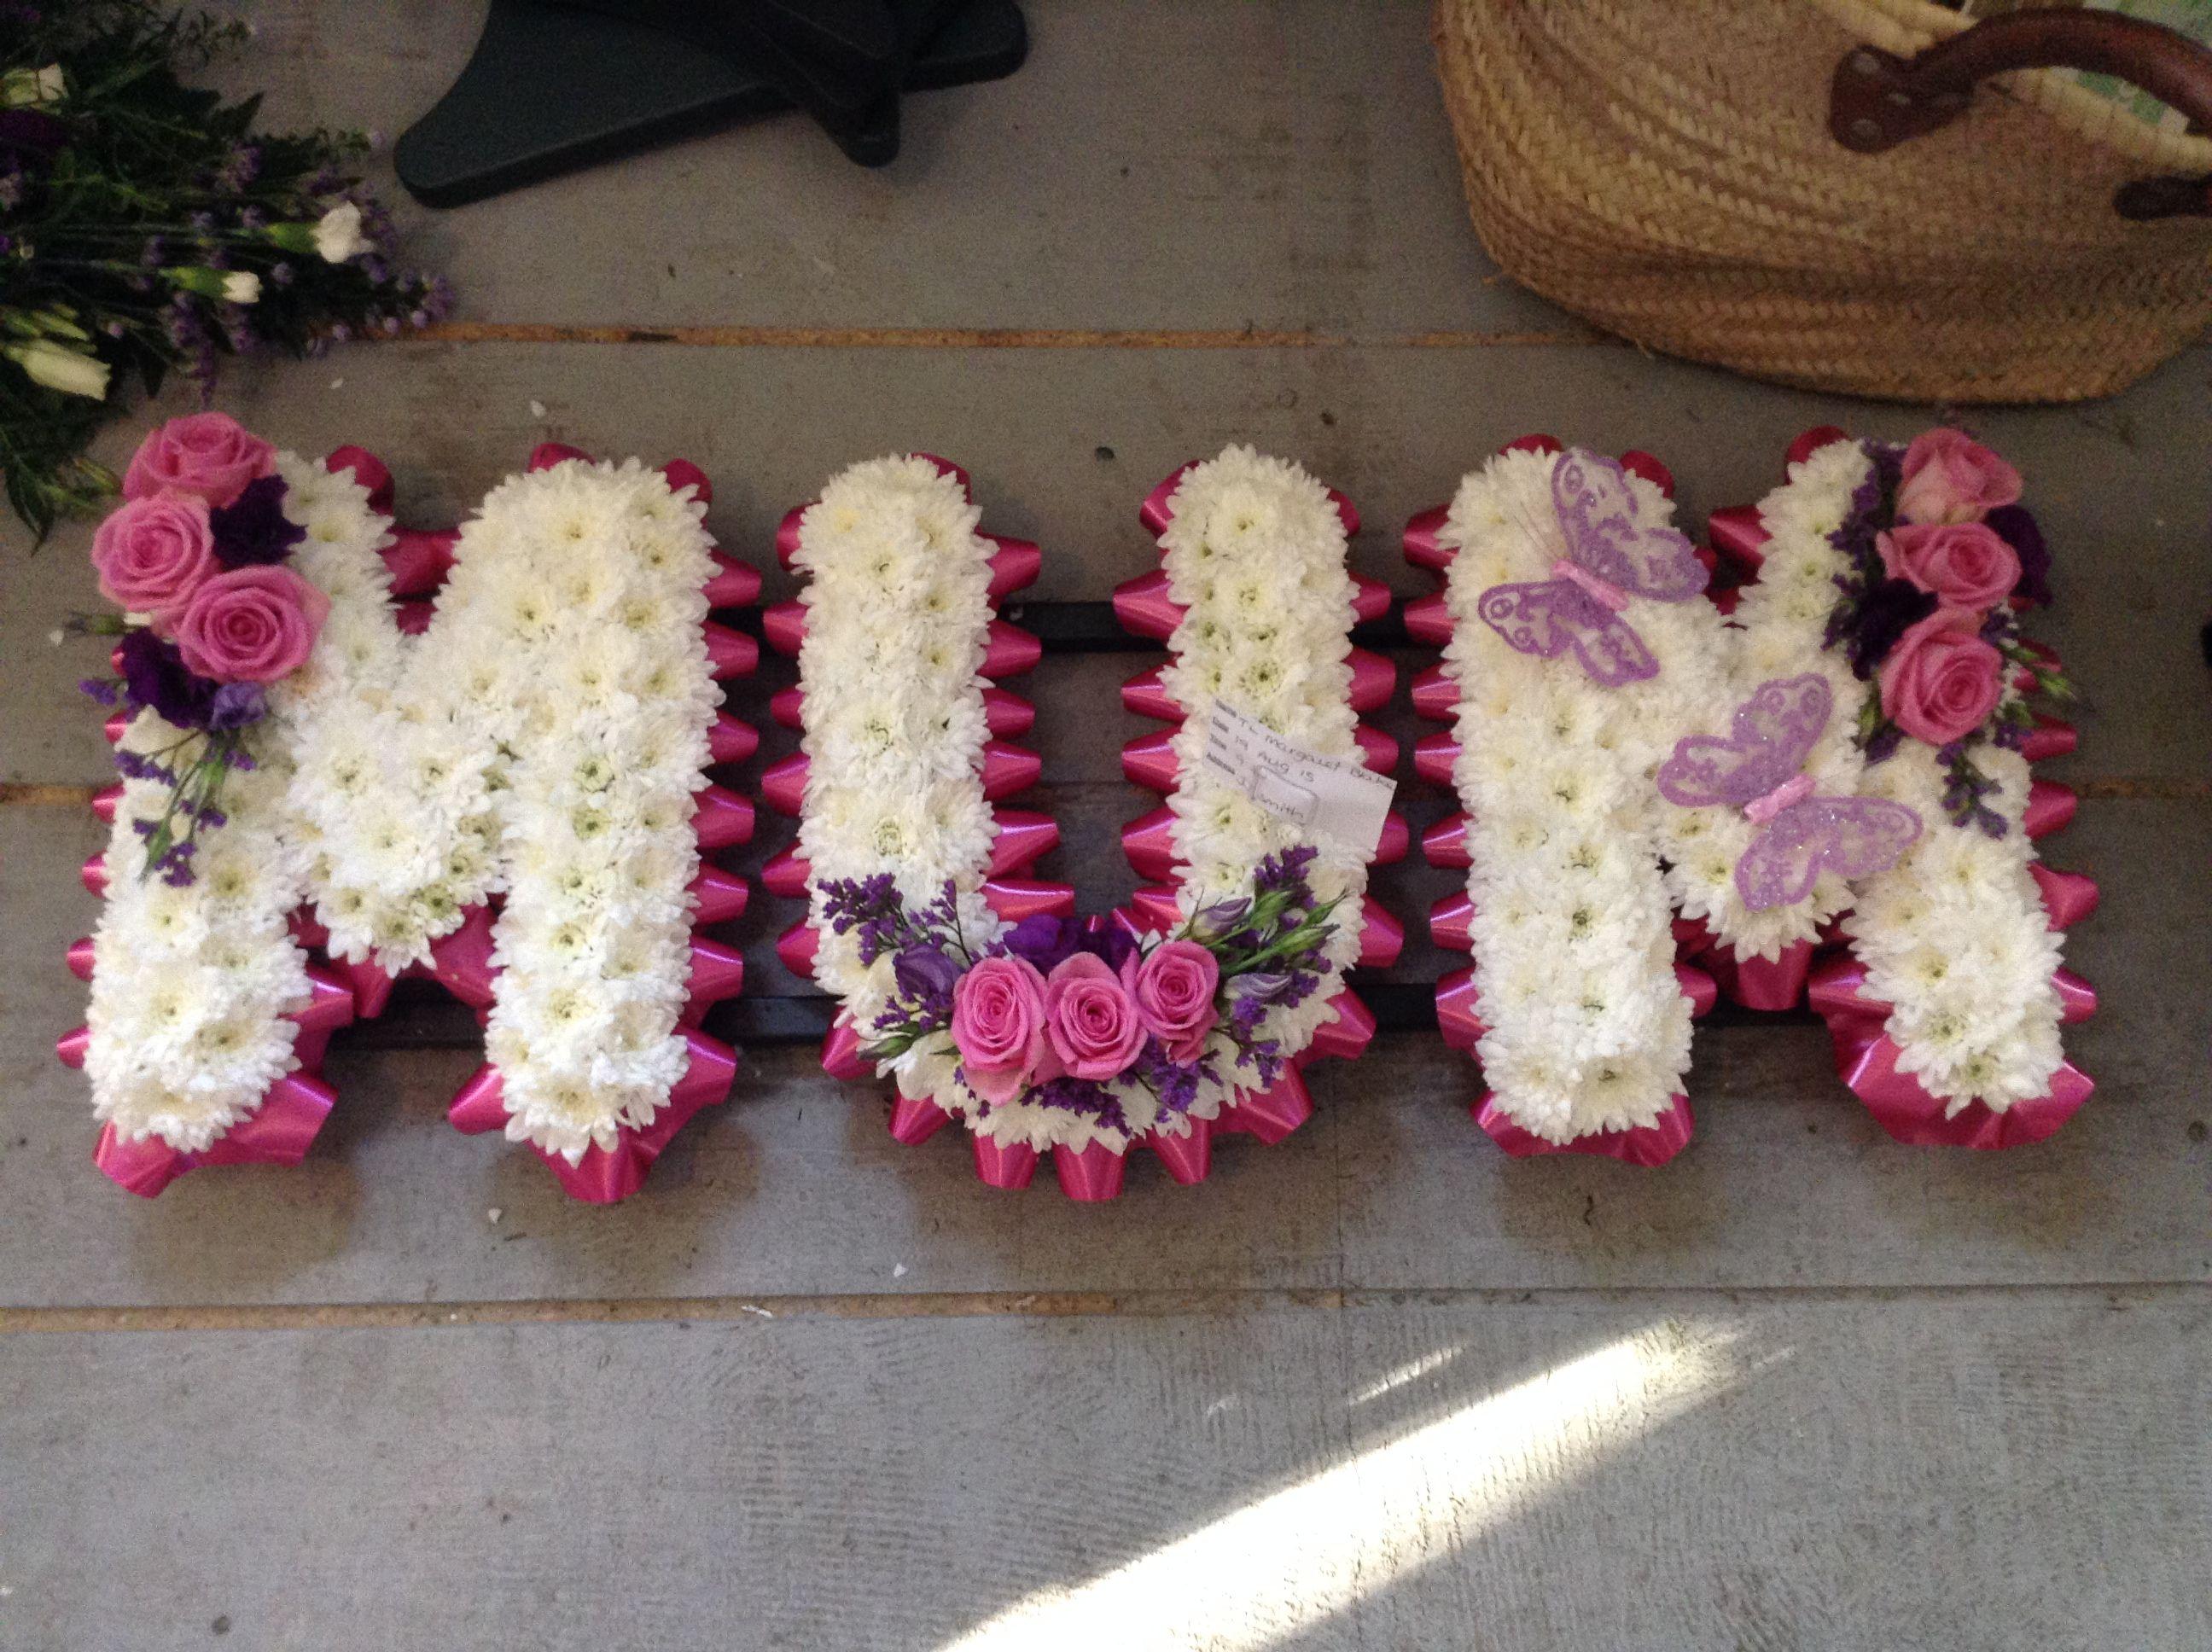 Funeral flowers mum funeral flower letters flowers for mums funeral flowers mum funeral flower letters flowers for mums funeral pink and white dhlflorist Gallery